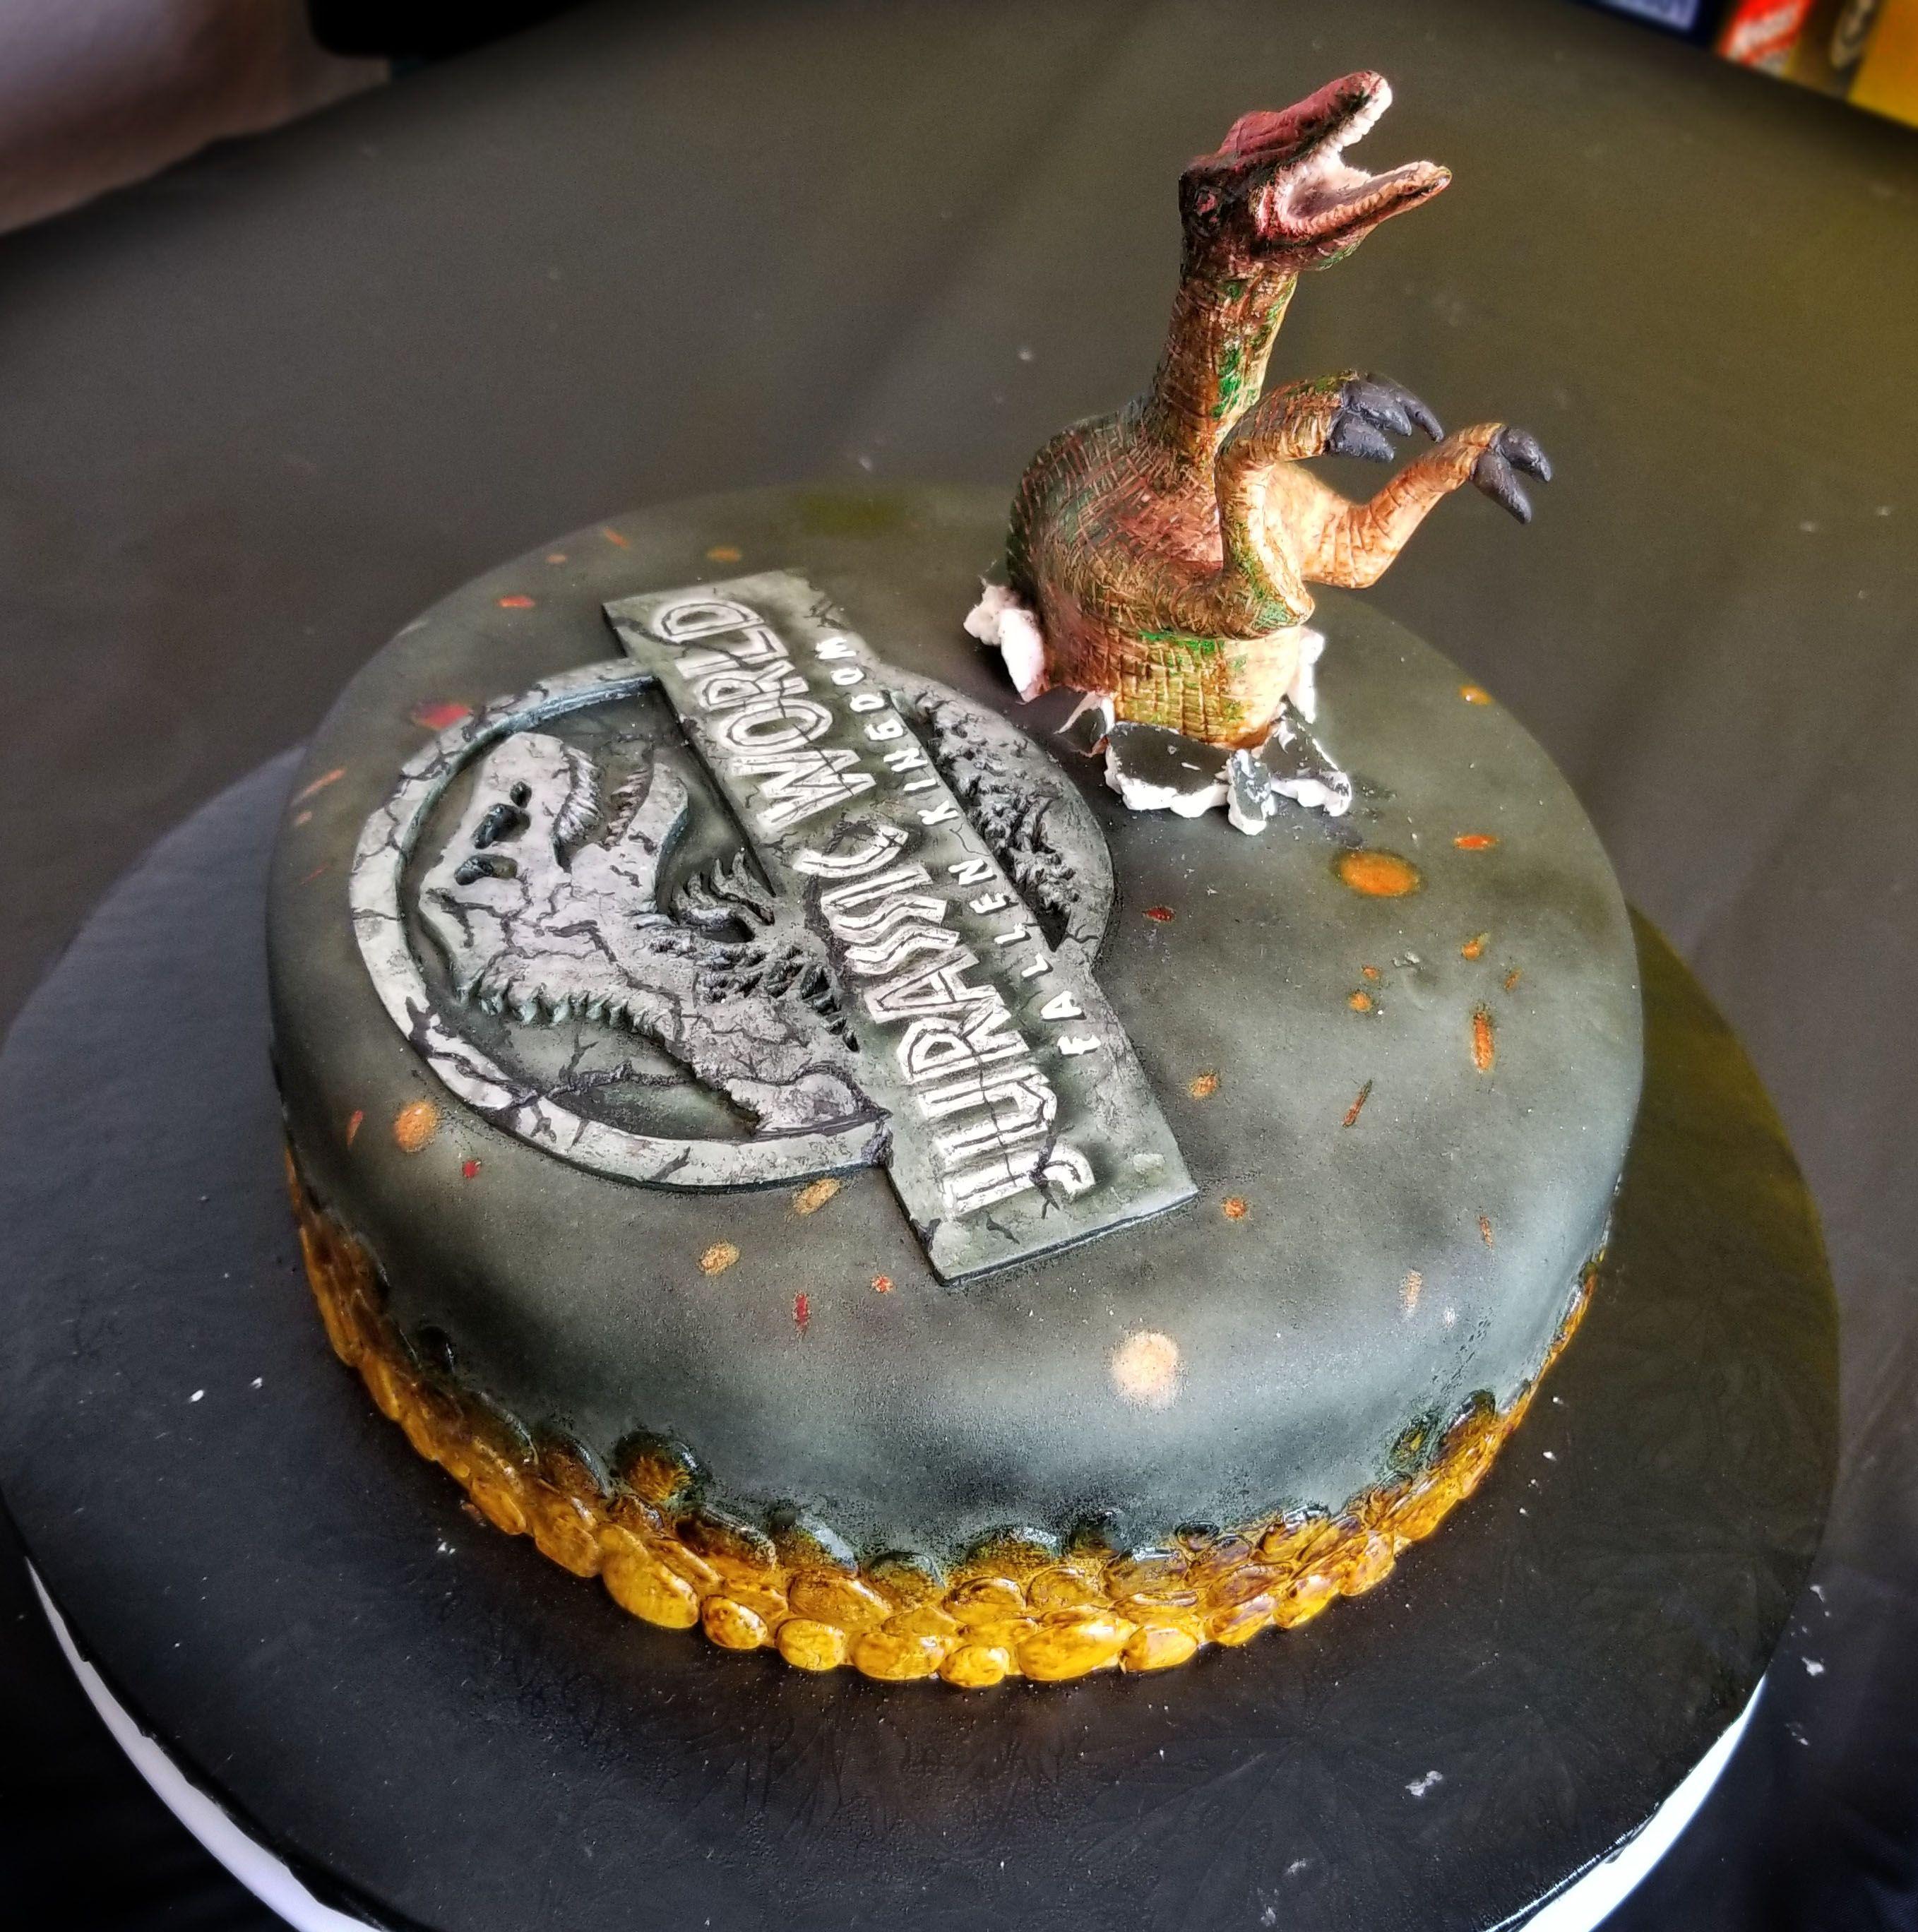 Jurassic World 2 Fallen Kingdom Cake Tutorial On Youtube By